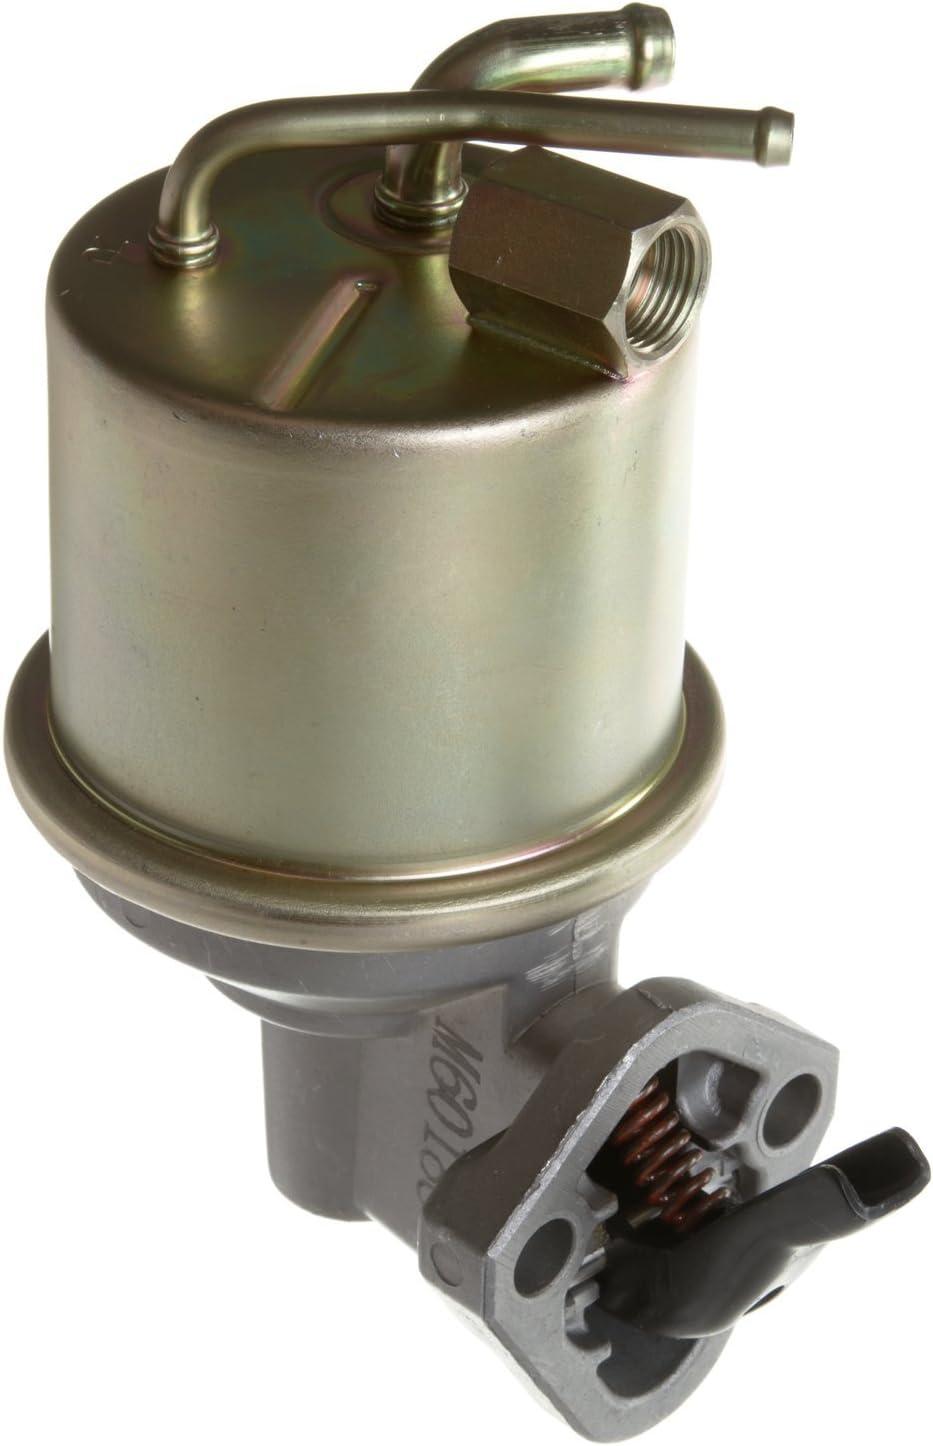 Prime Choice Auto Parts HB613328PR Front Pair 2 Wheel Hub Bearing Assemblies 7 Stud